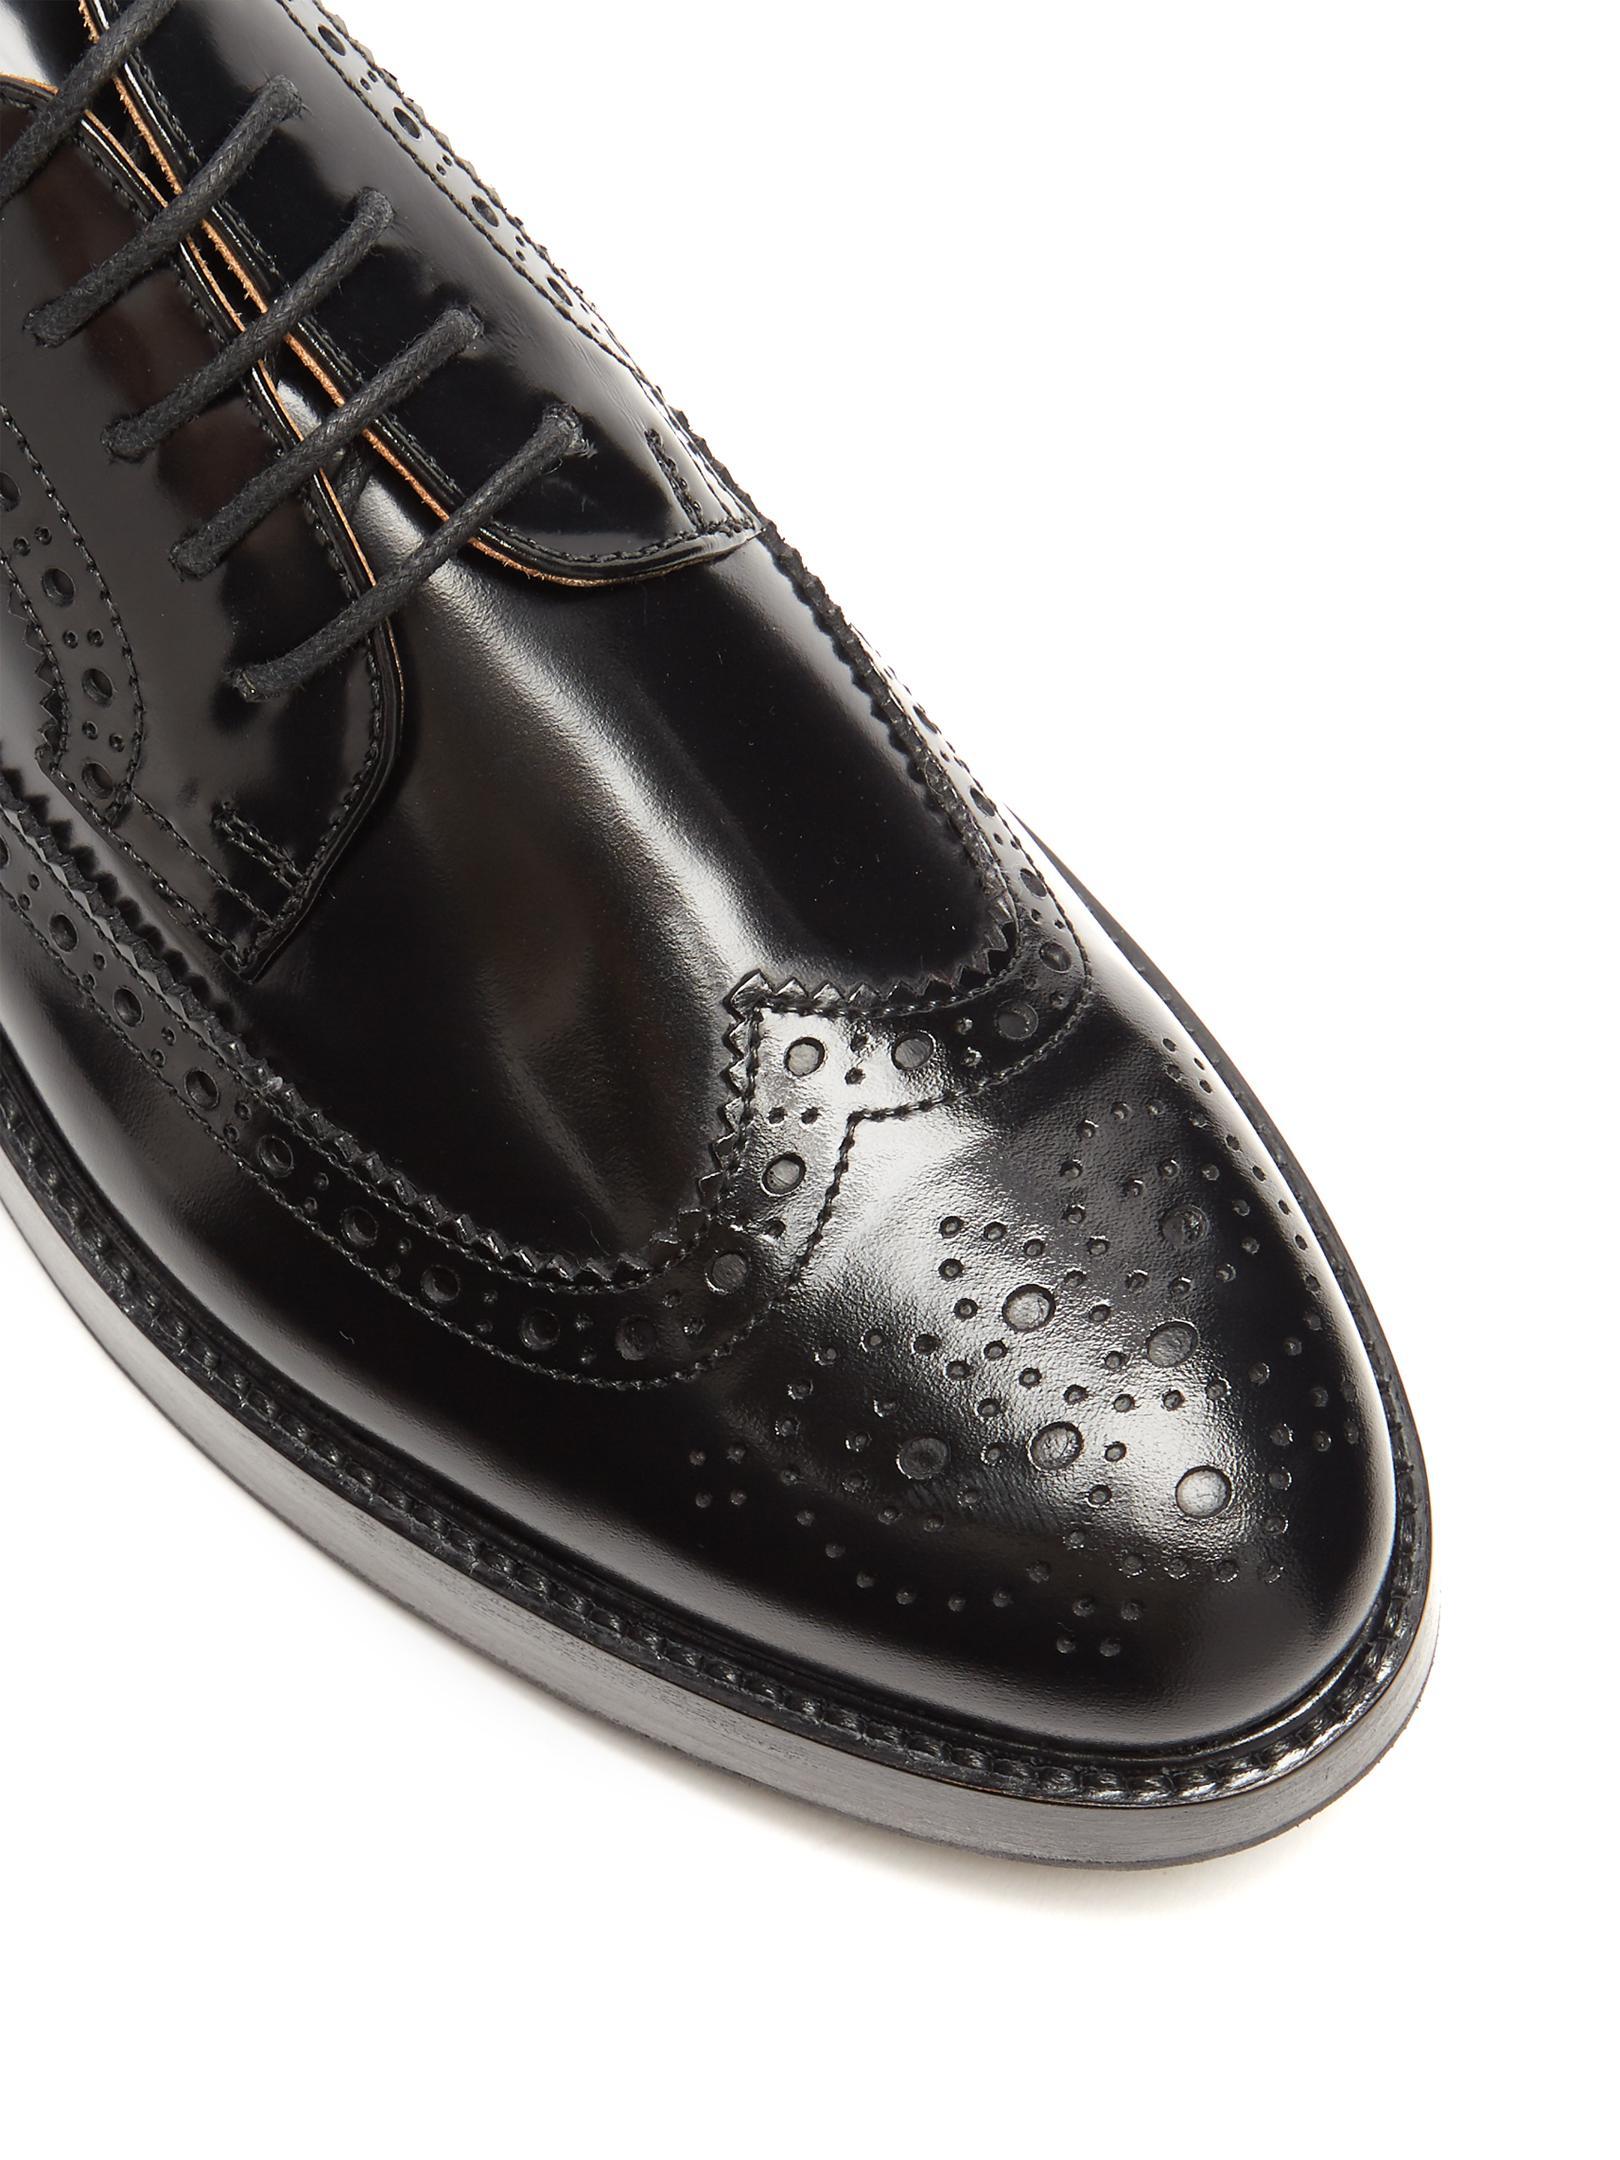 5b76cf2c992 Lyst - Church s Opal Leather Flatform Brogues in Black